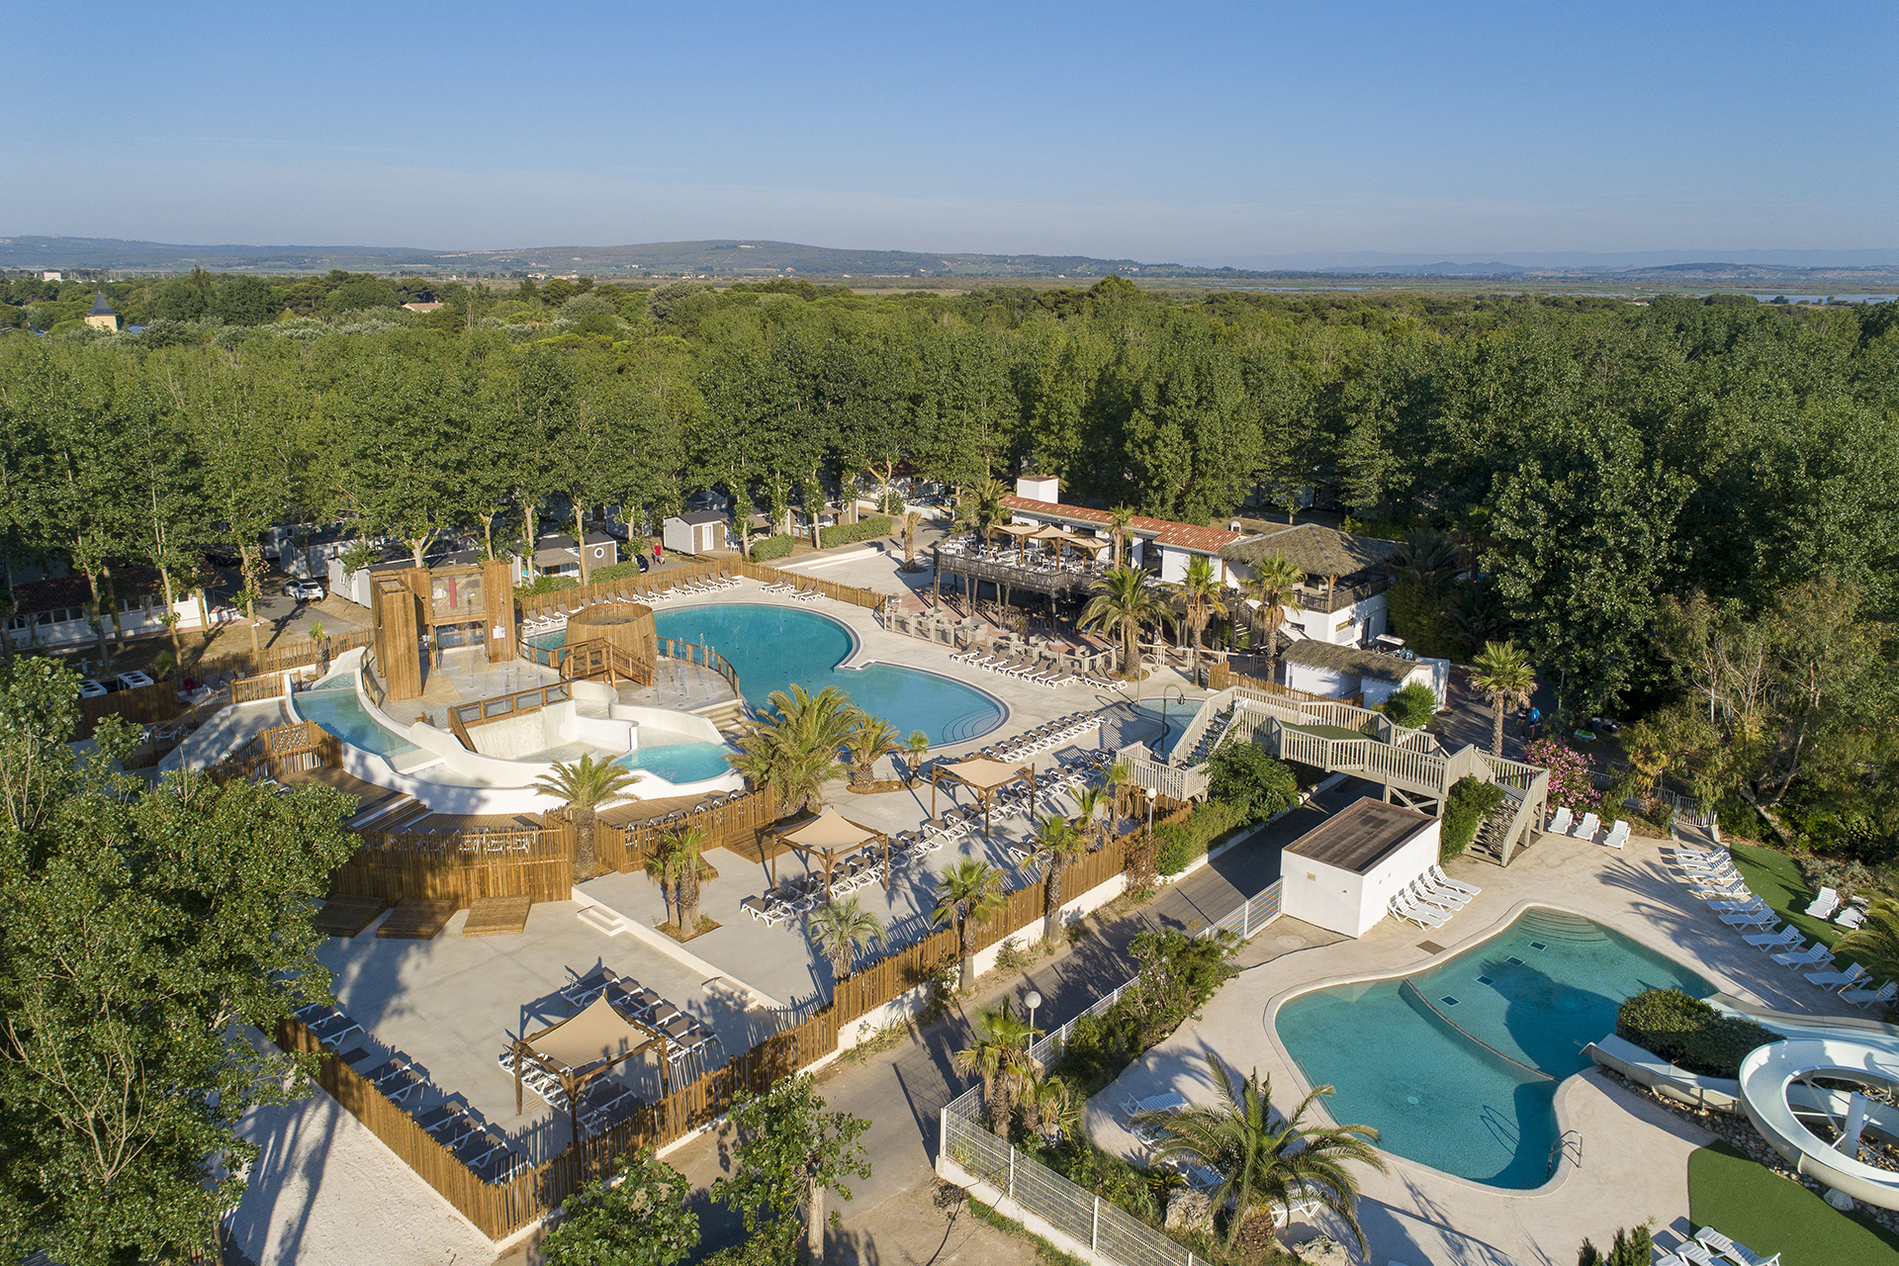 Frankrijk-ValrasPlage-Camping%20Sandaya%20Blue%20Bayou-ExtraLarge Wintersport Frankrijk Pagina 9 van 55